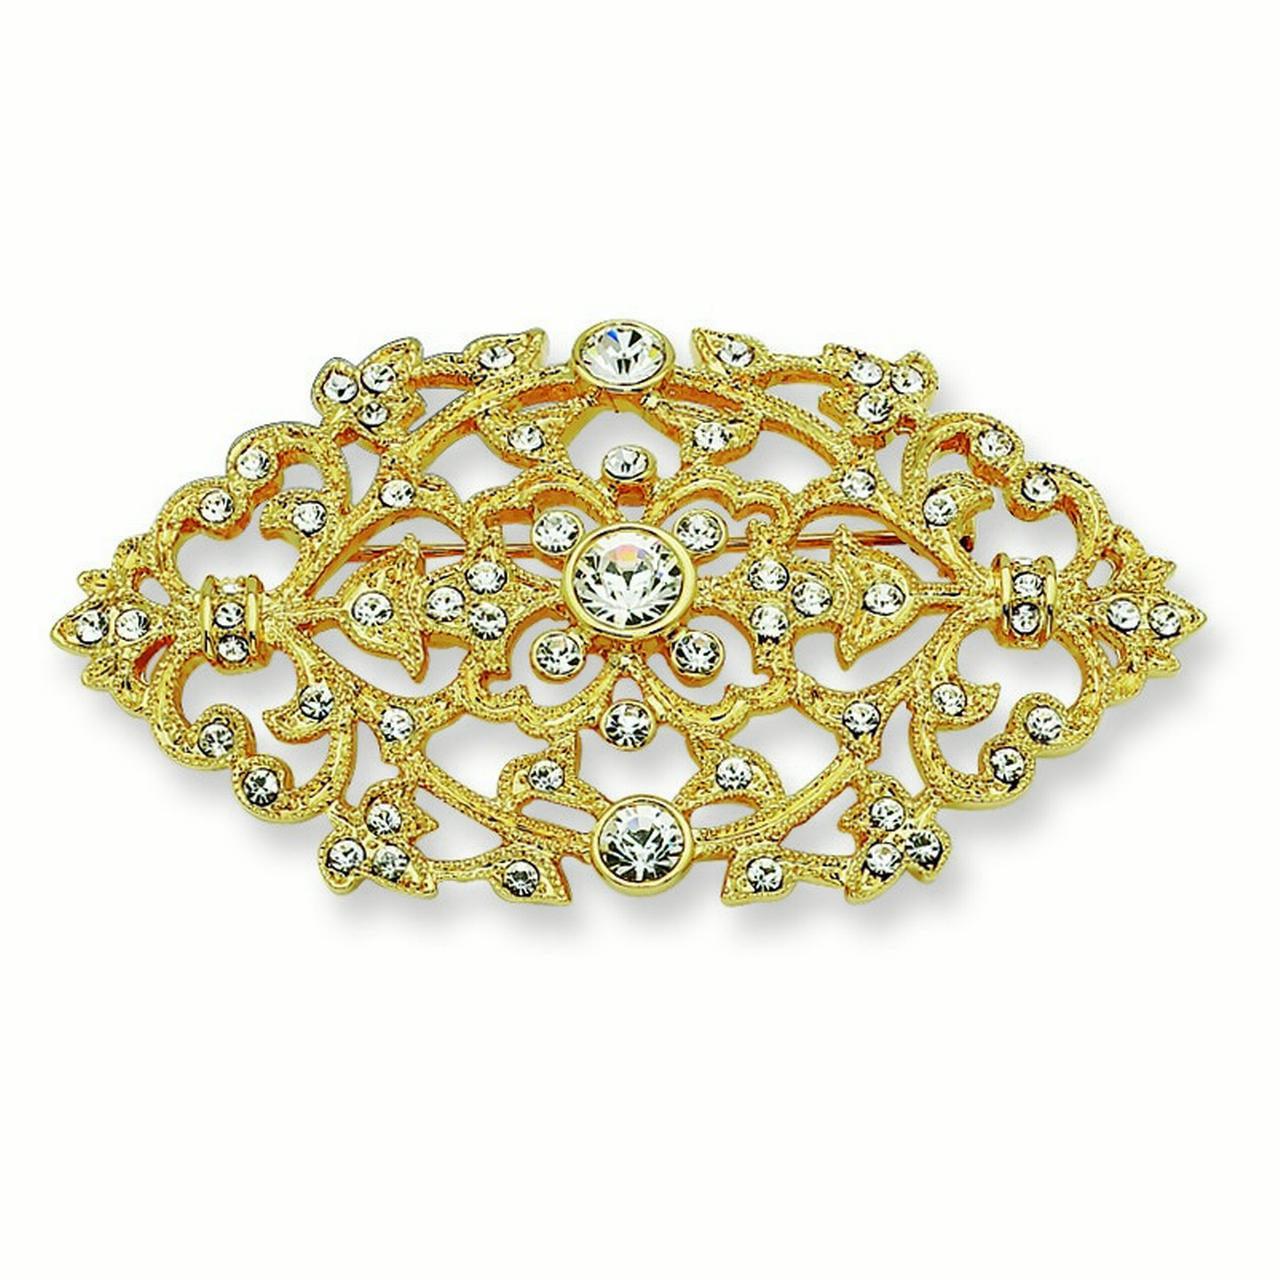 Gold-plated Swarovski Element Crystal Floral Brooch Pin